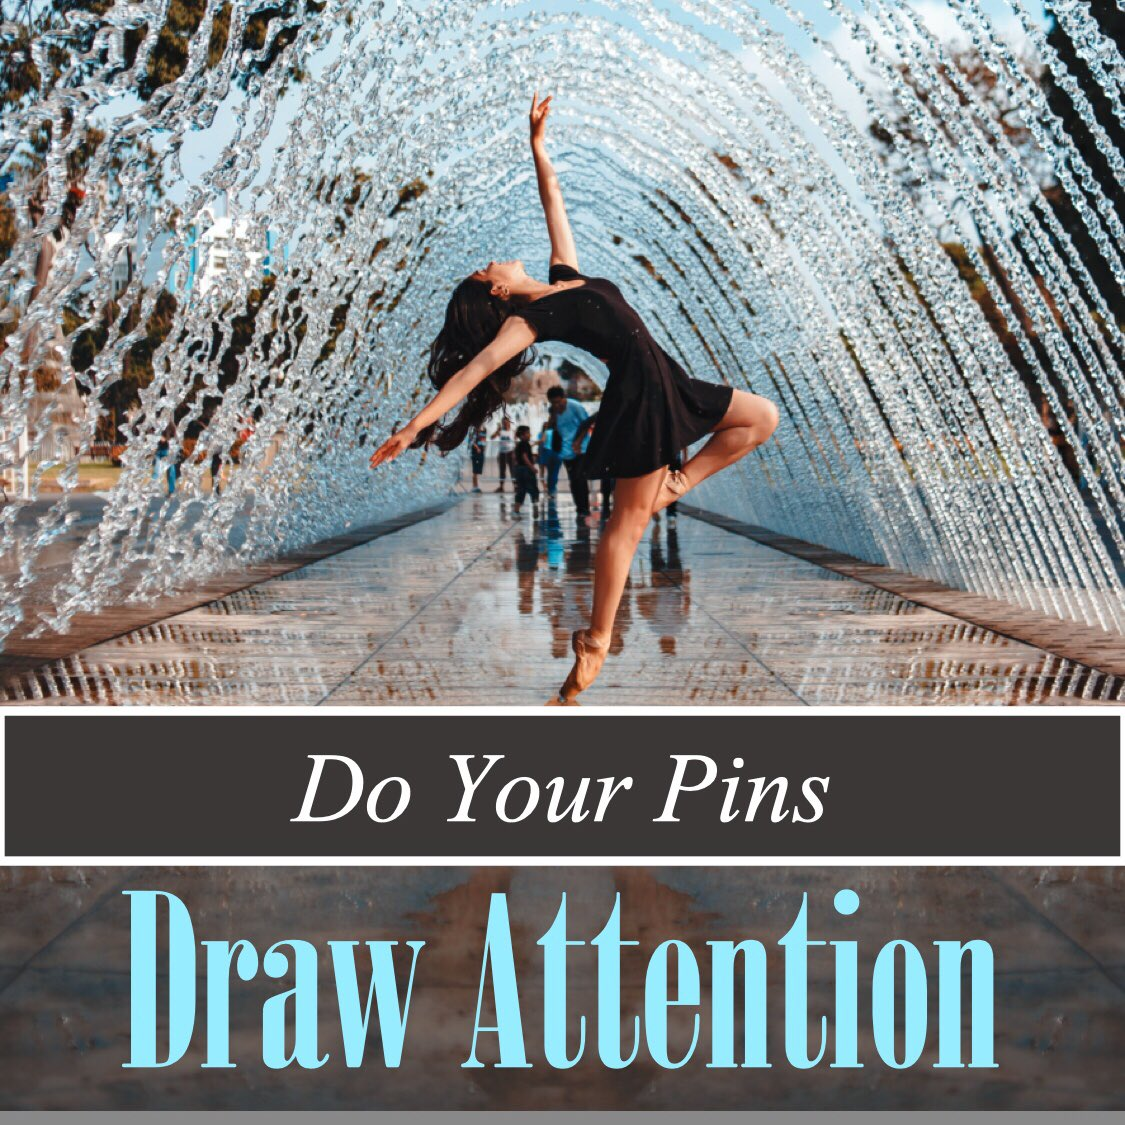 Do your pins draw attention? Visit the pin design studio for package details! https://chrisdovewrites.com/pin-design-studio… #MarketingDigital #promotionpic.twitter.com/GjoHGJUEO9